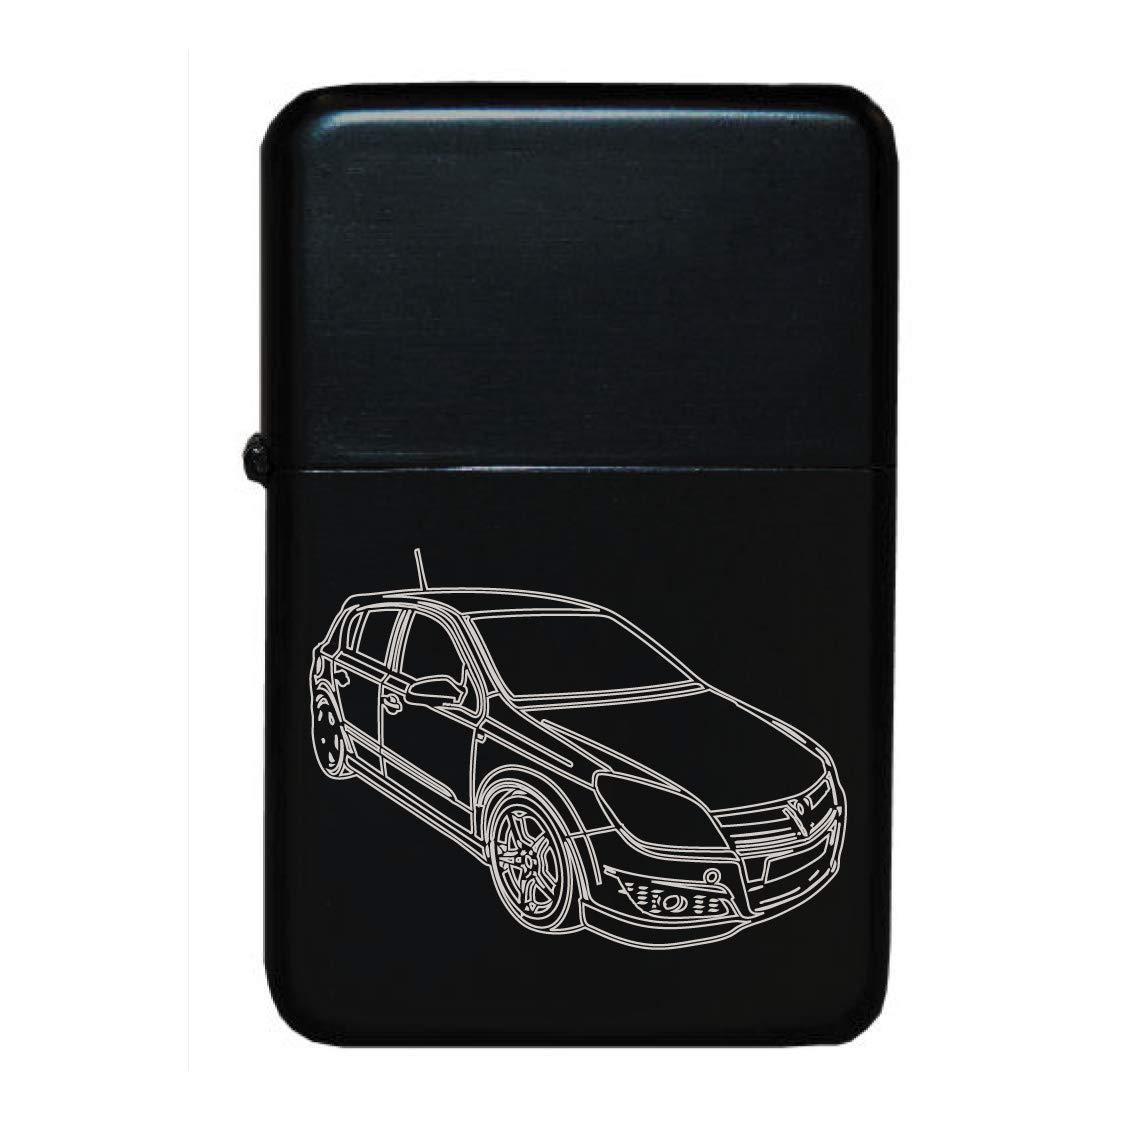 Notts Laserfeuerzeug fü r Opel Astra (1) Star Lighter